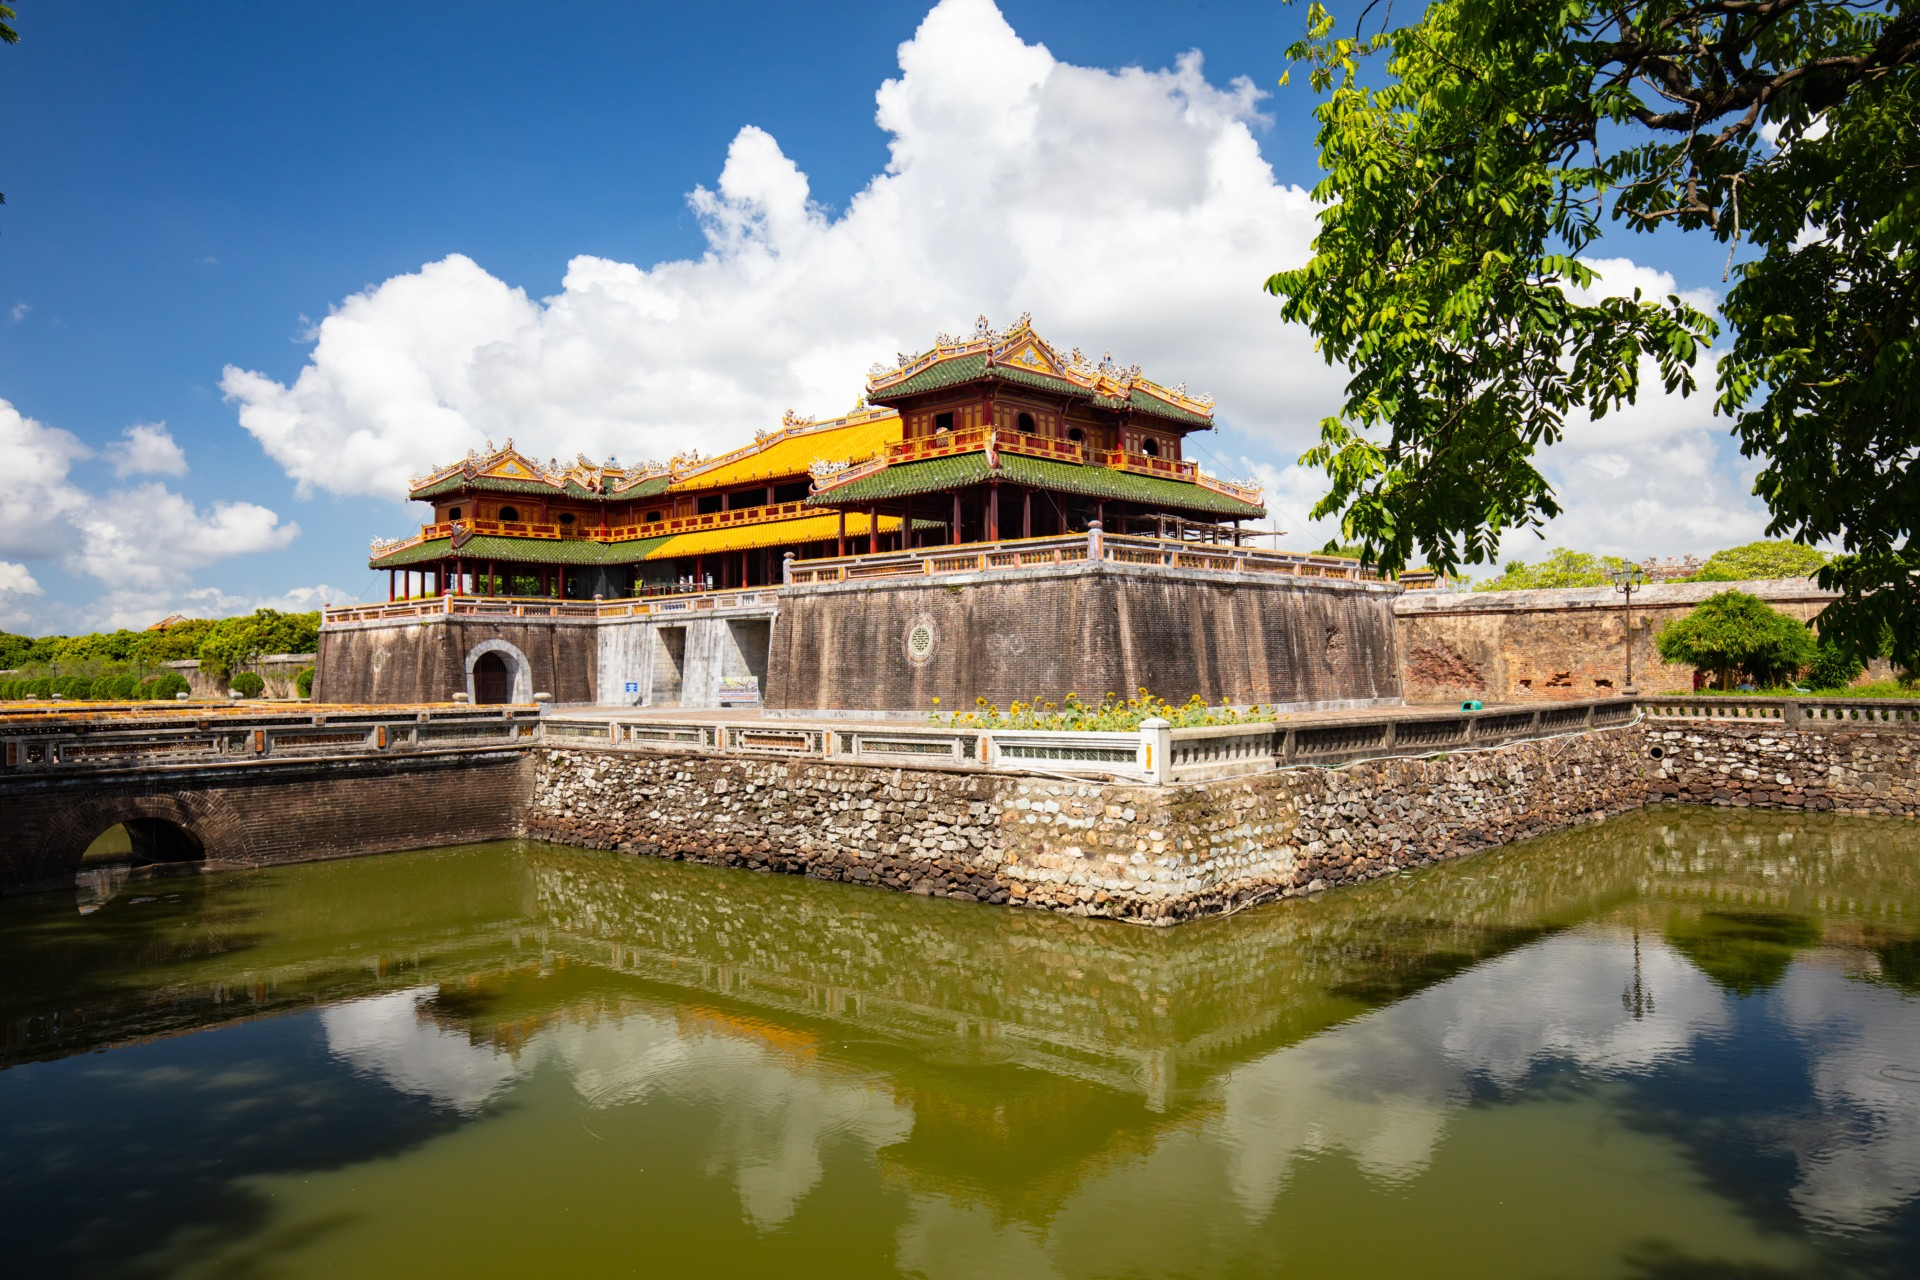 Hue Imperial Citadel Tours